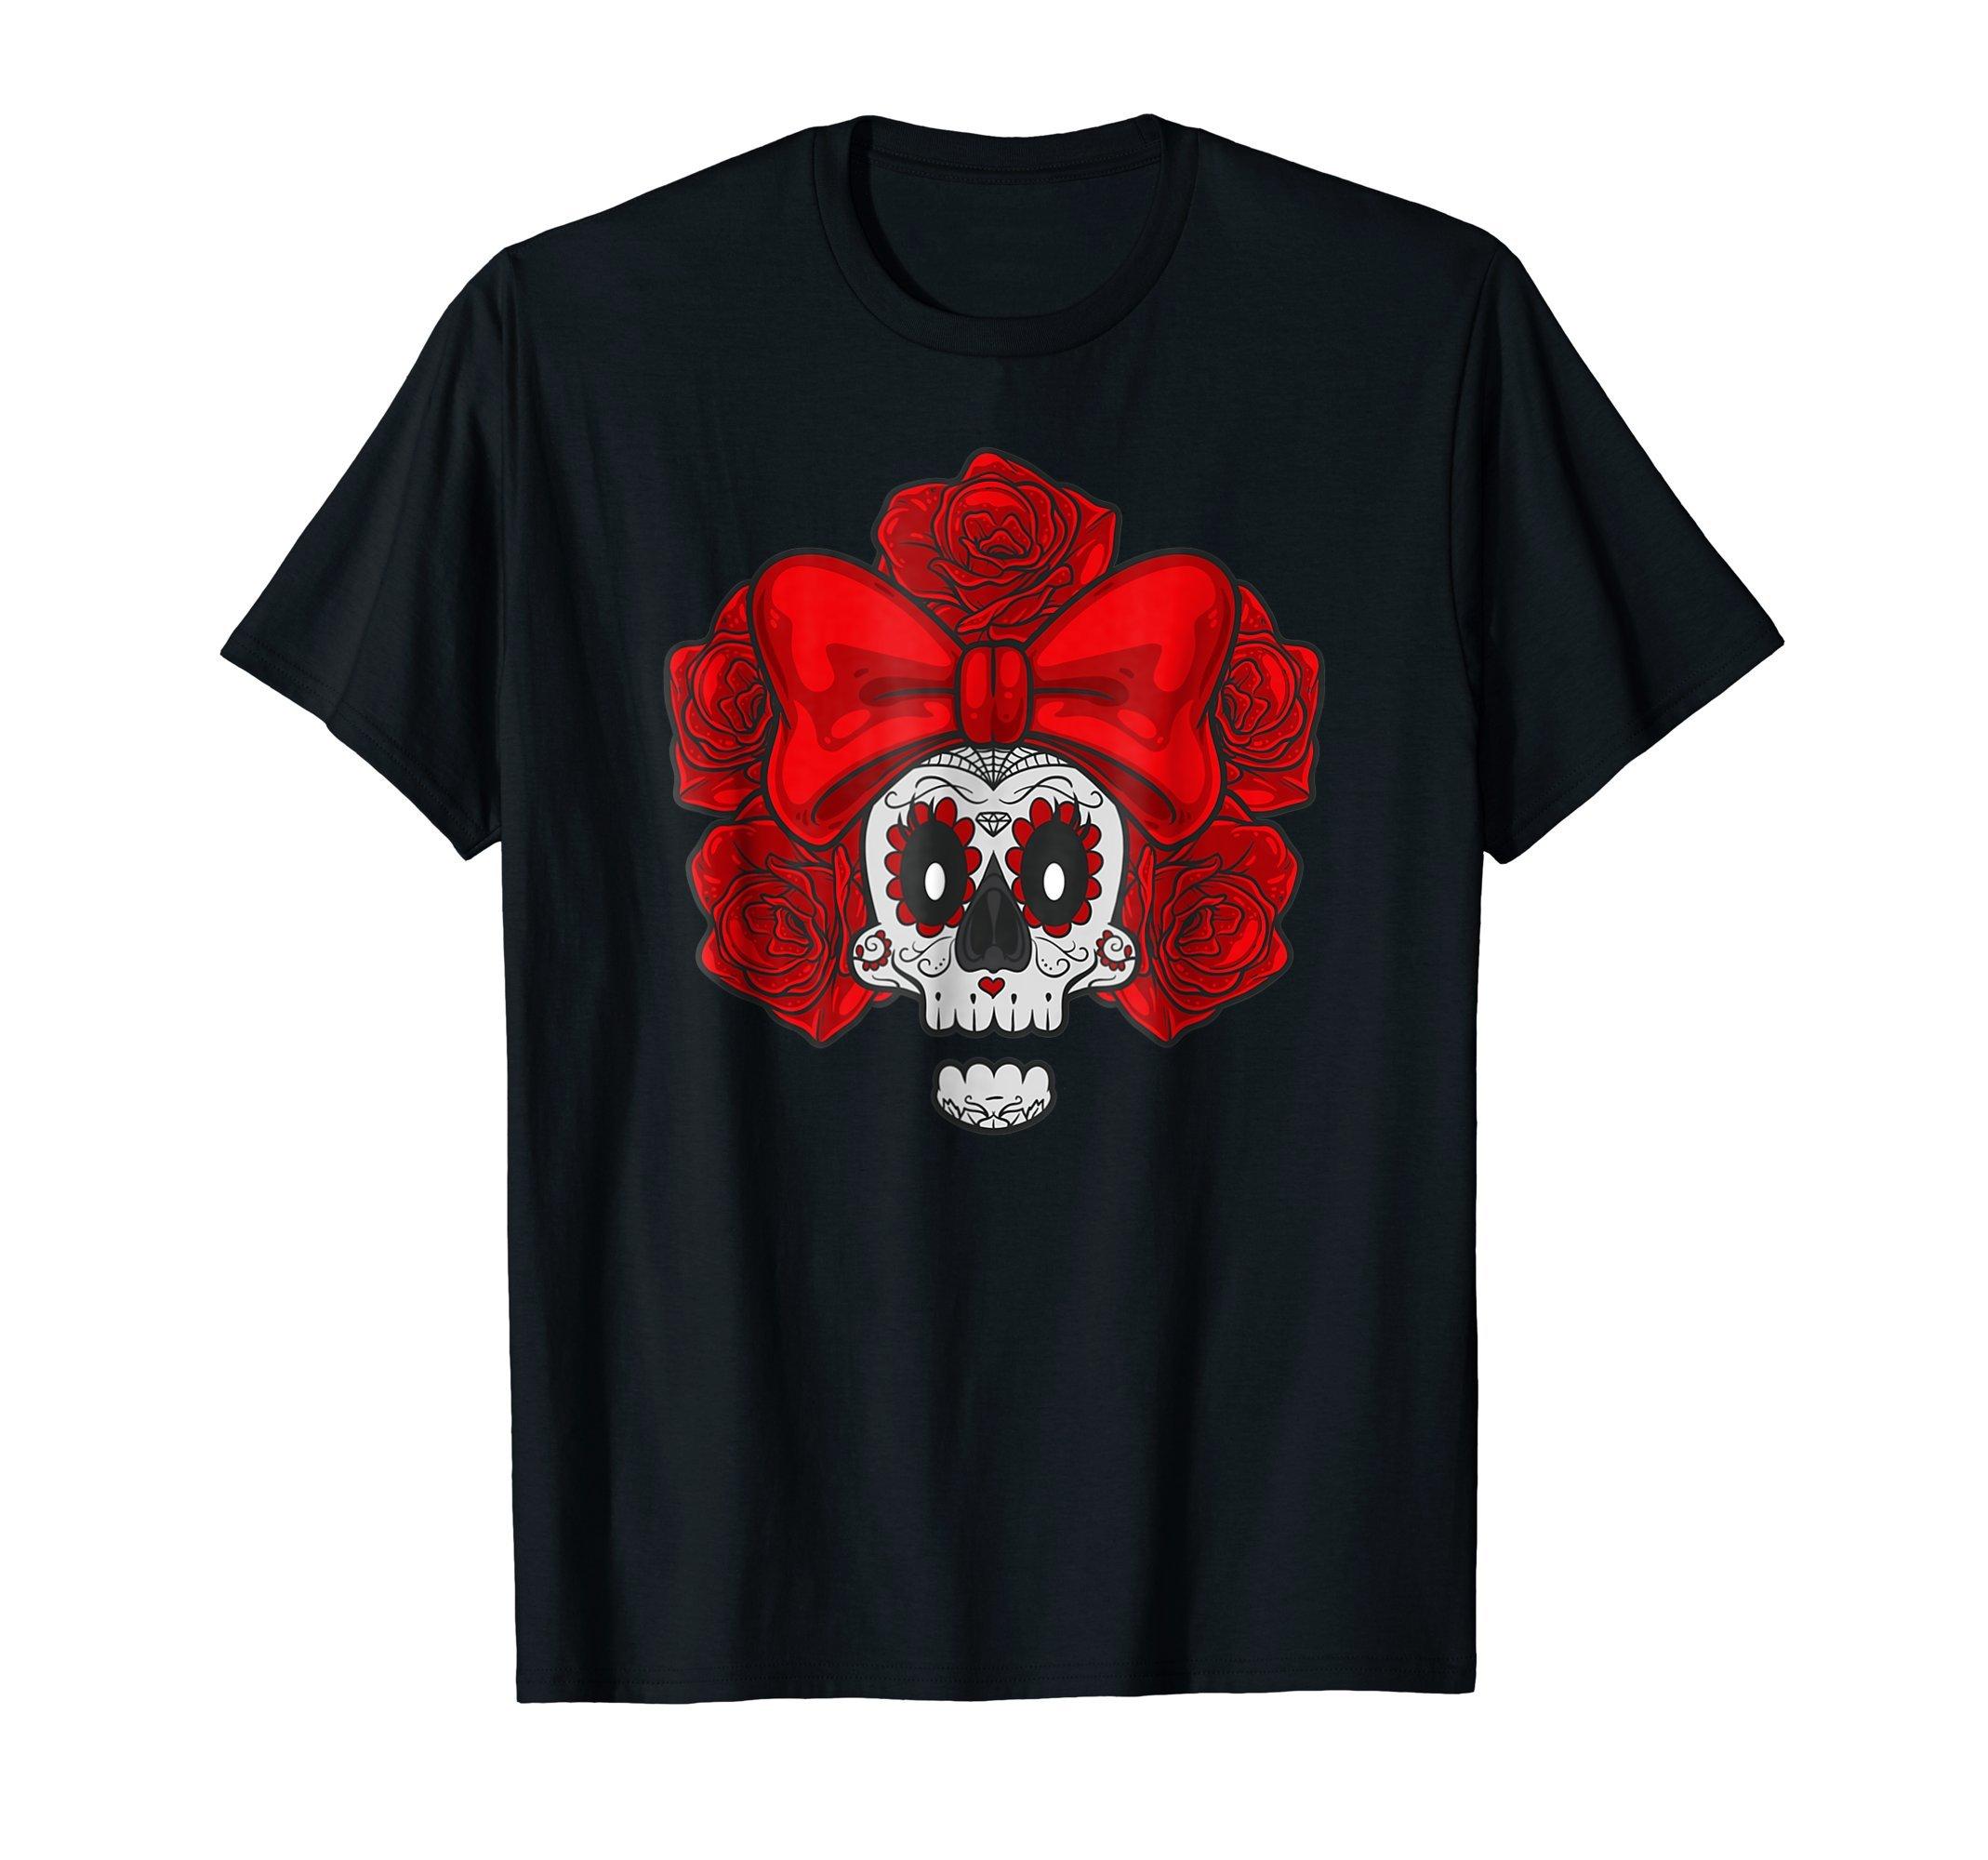 Sugar-Skull-with-Ribbon-Roses-Halloween-costume-T-Shirt